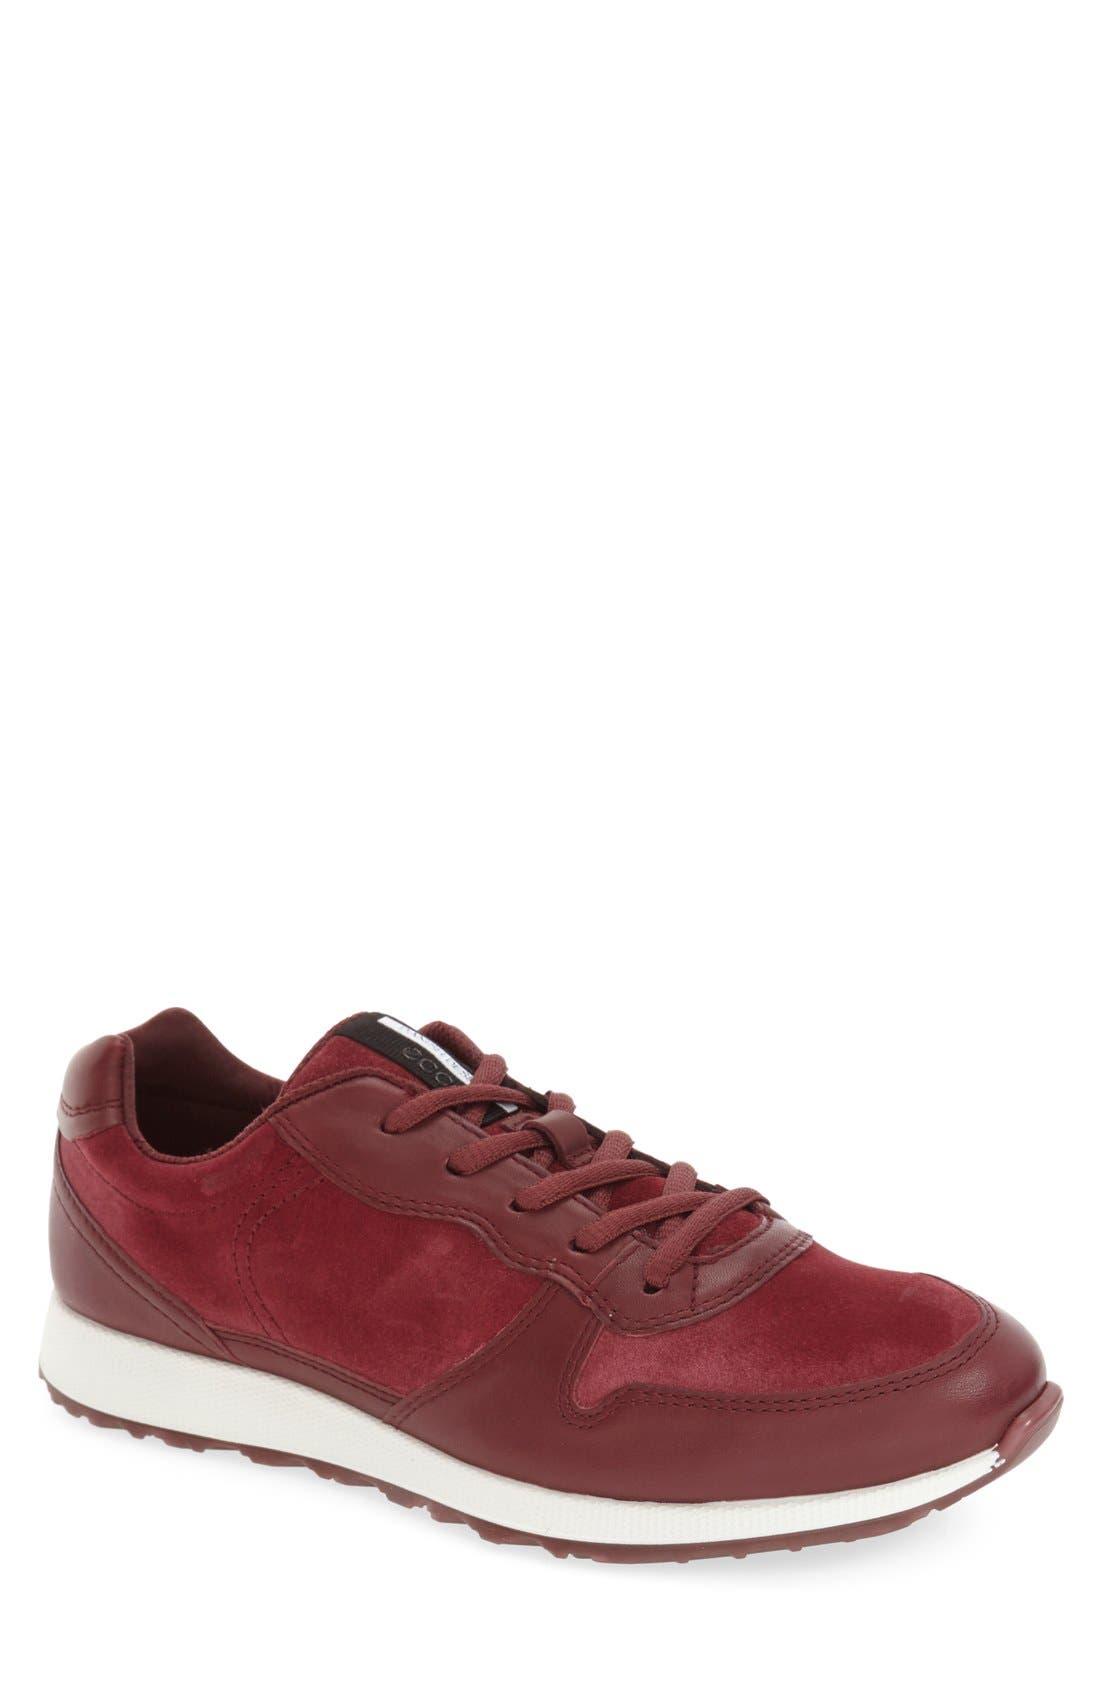 Alternate Image 1 Selected - ECCO 'Sneak' Sneaker (Women)